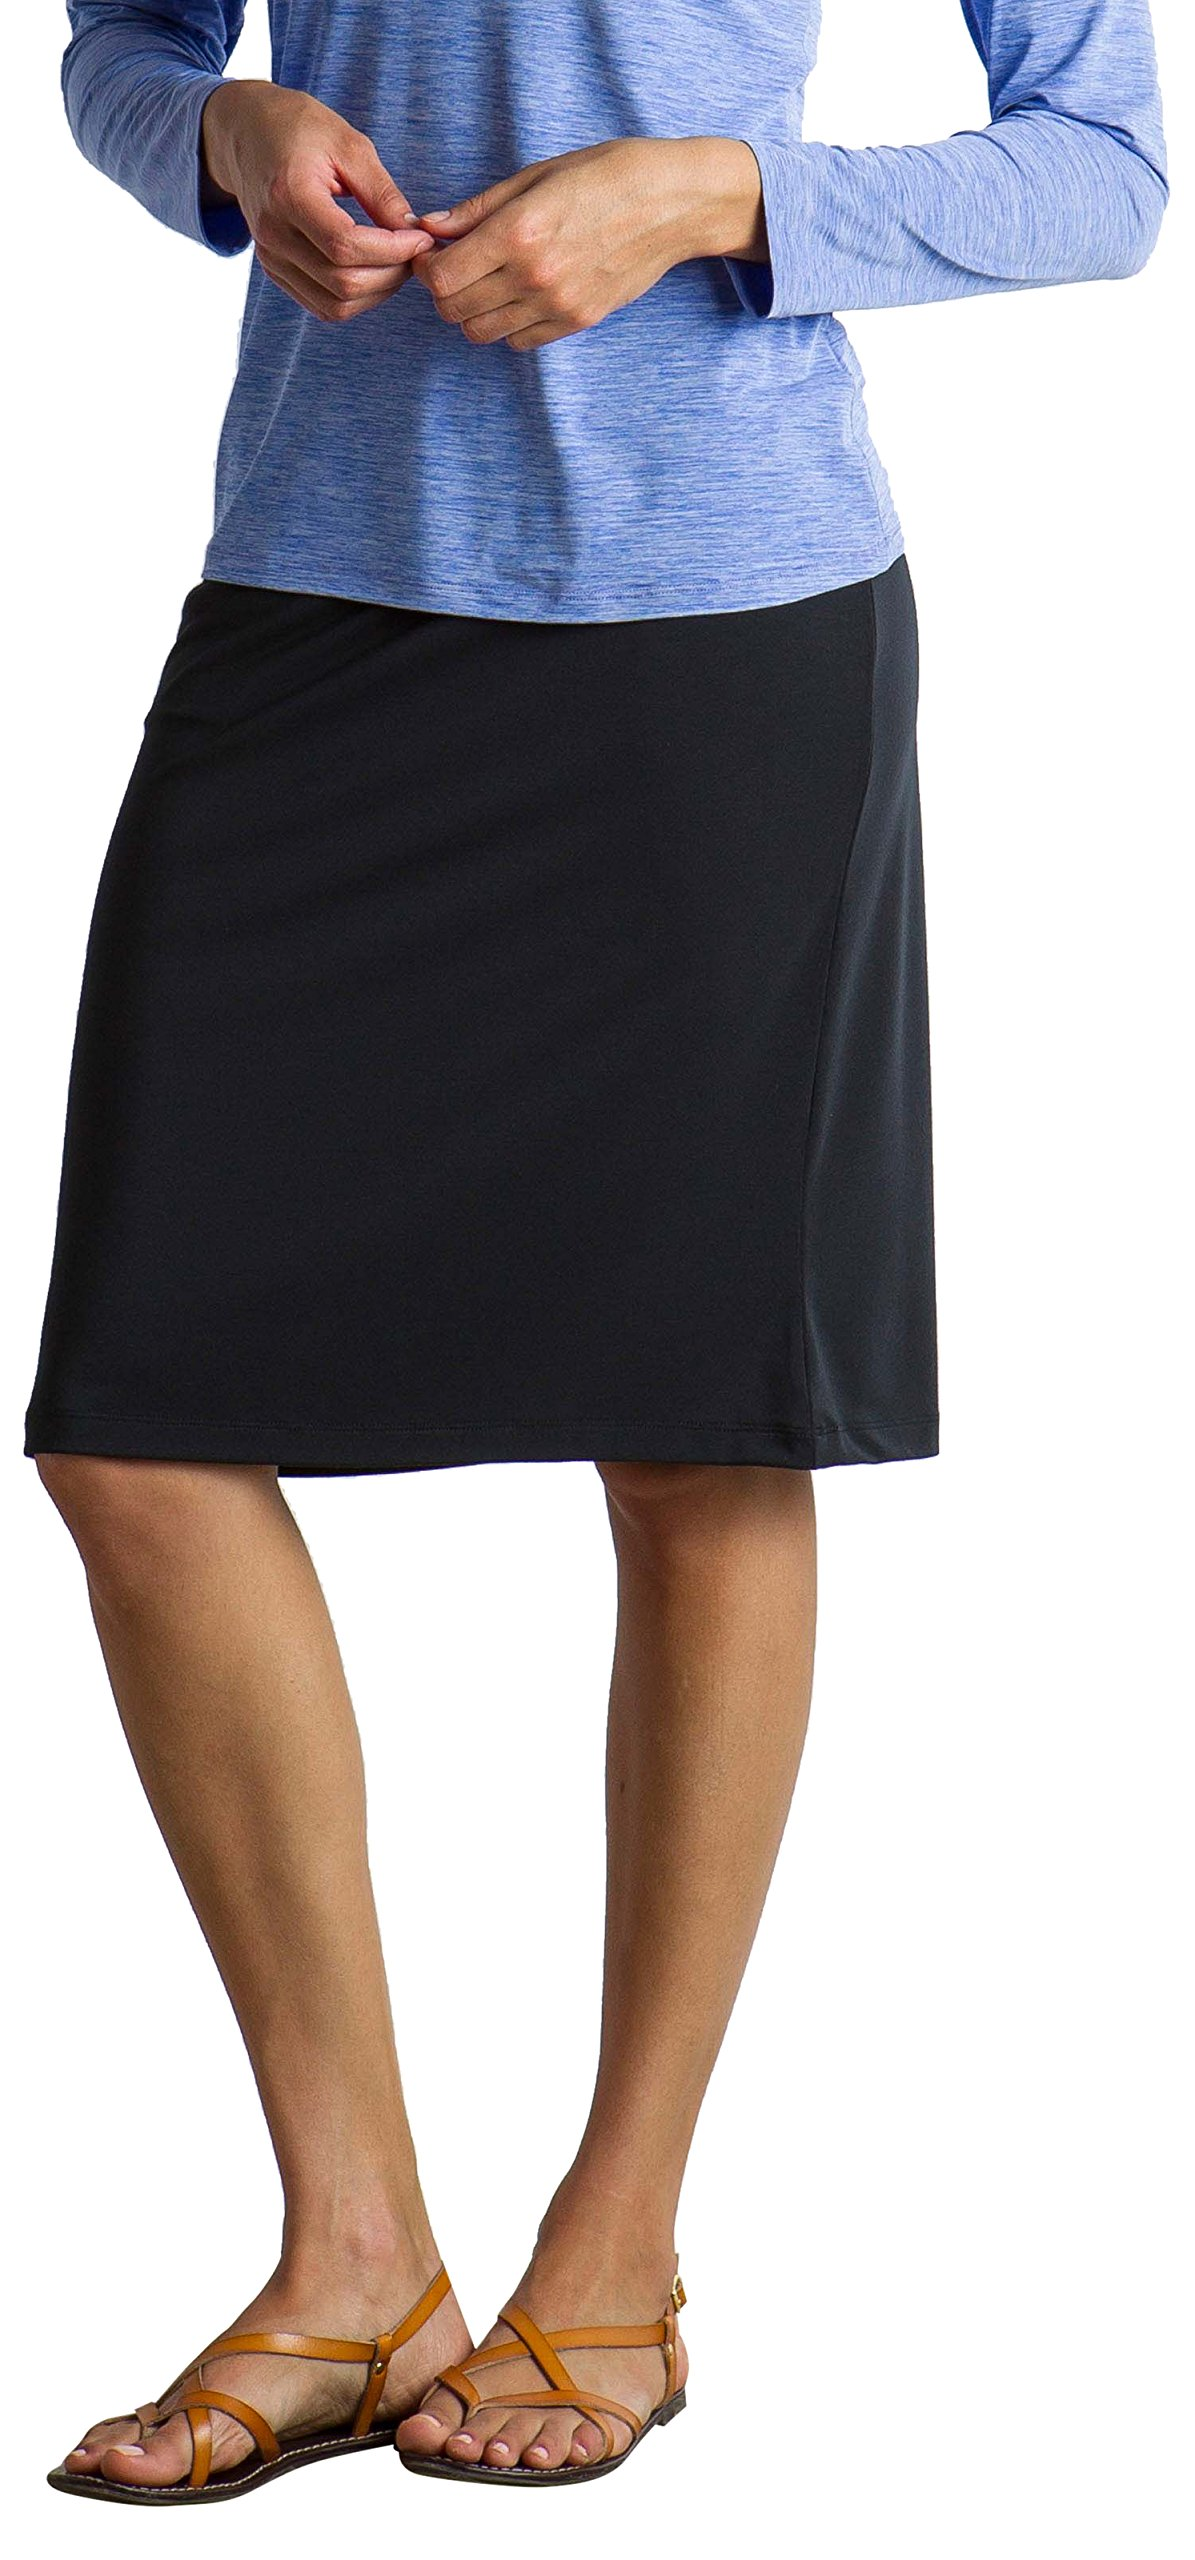 ExOfficio Women's Wanderlux Short Skirt, Black, Large